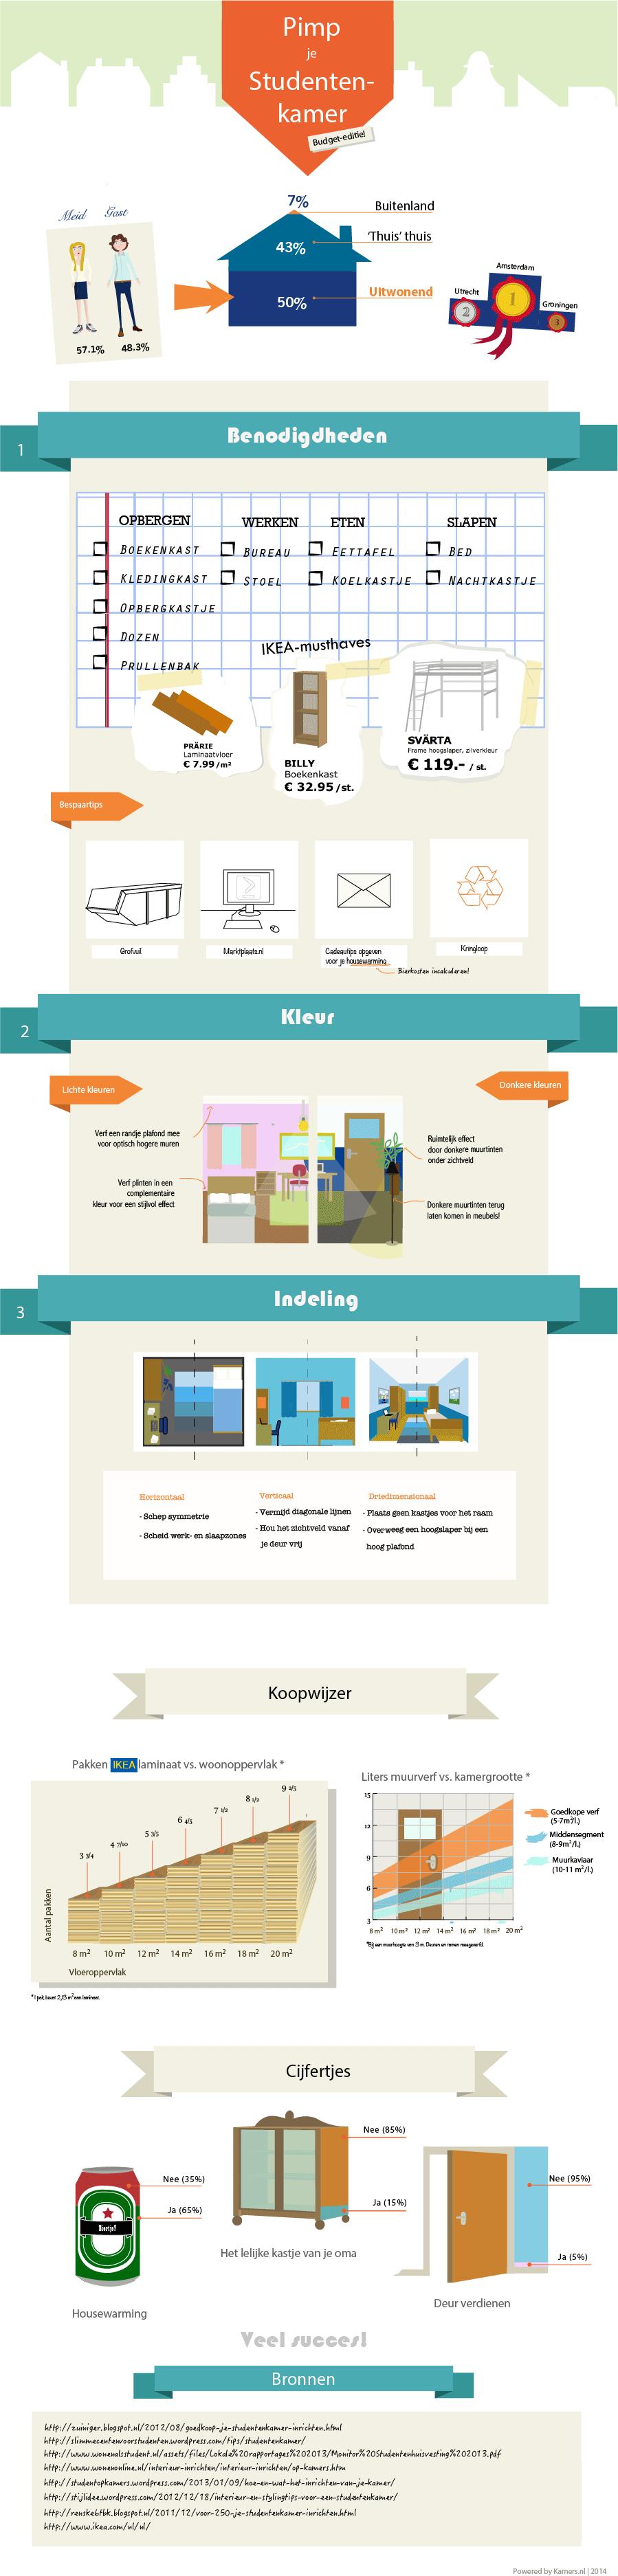 Infographic Pimp je studentenkamer in 3 stappen